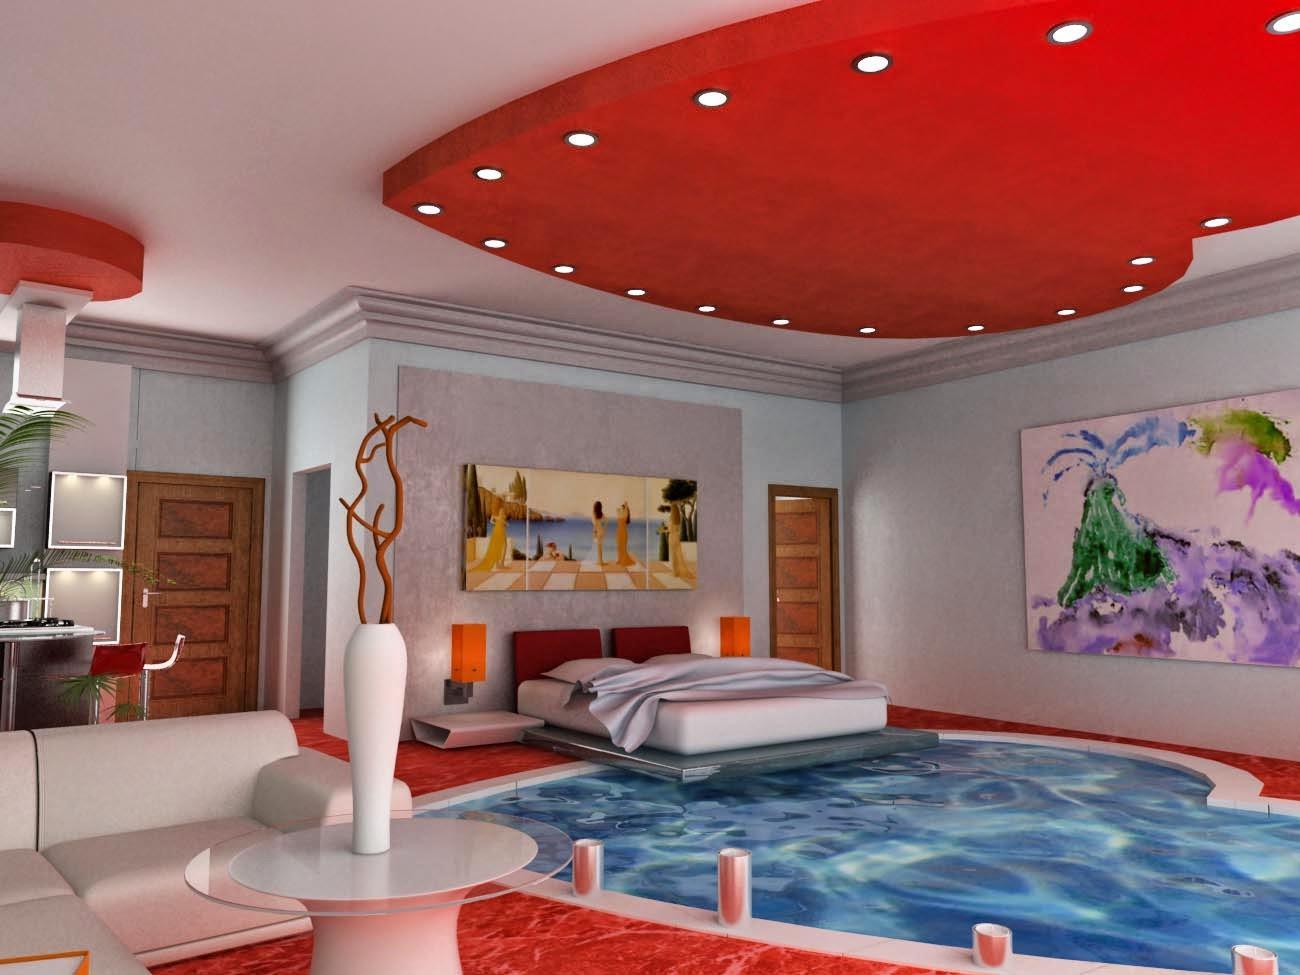 diaforetiko.gr : ad poolbedroom 251 10+3 υπνοδωμάτια με πισίνα! Ζηλέψατε;